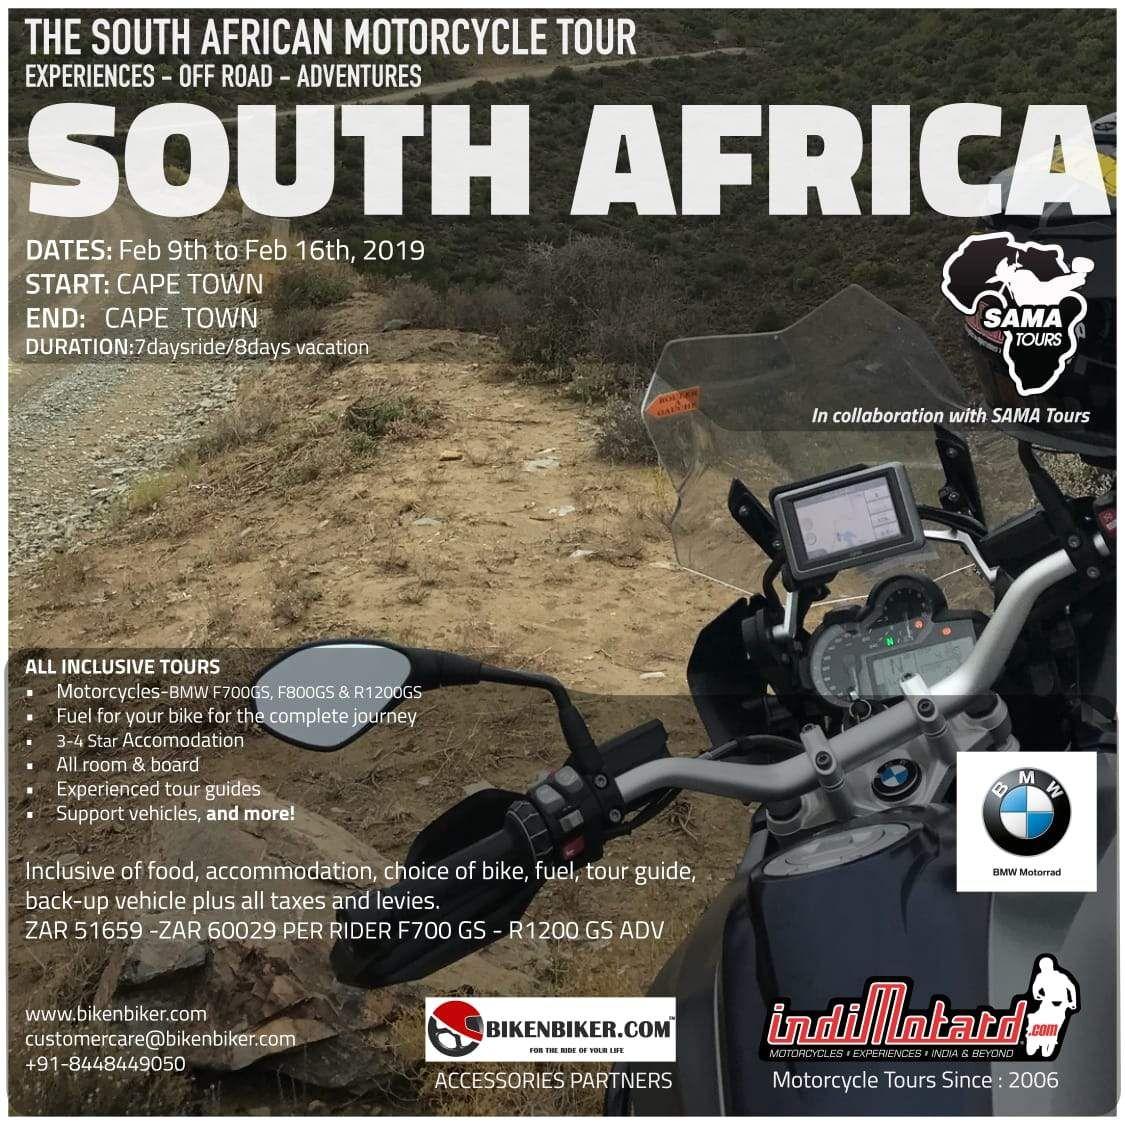 Check Out The Latest Product On Bikenbiker Com Garden Route Moto Http Www Bikenbiker Com Products Garden Route Motorcycle Tour Route Tours South Africa